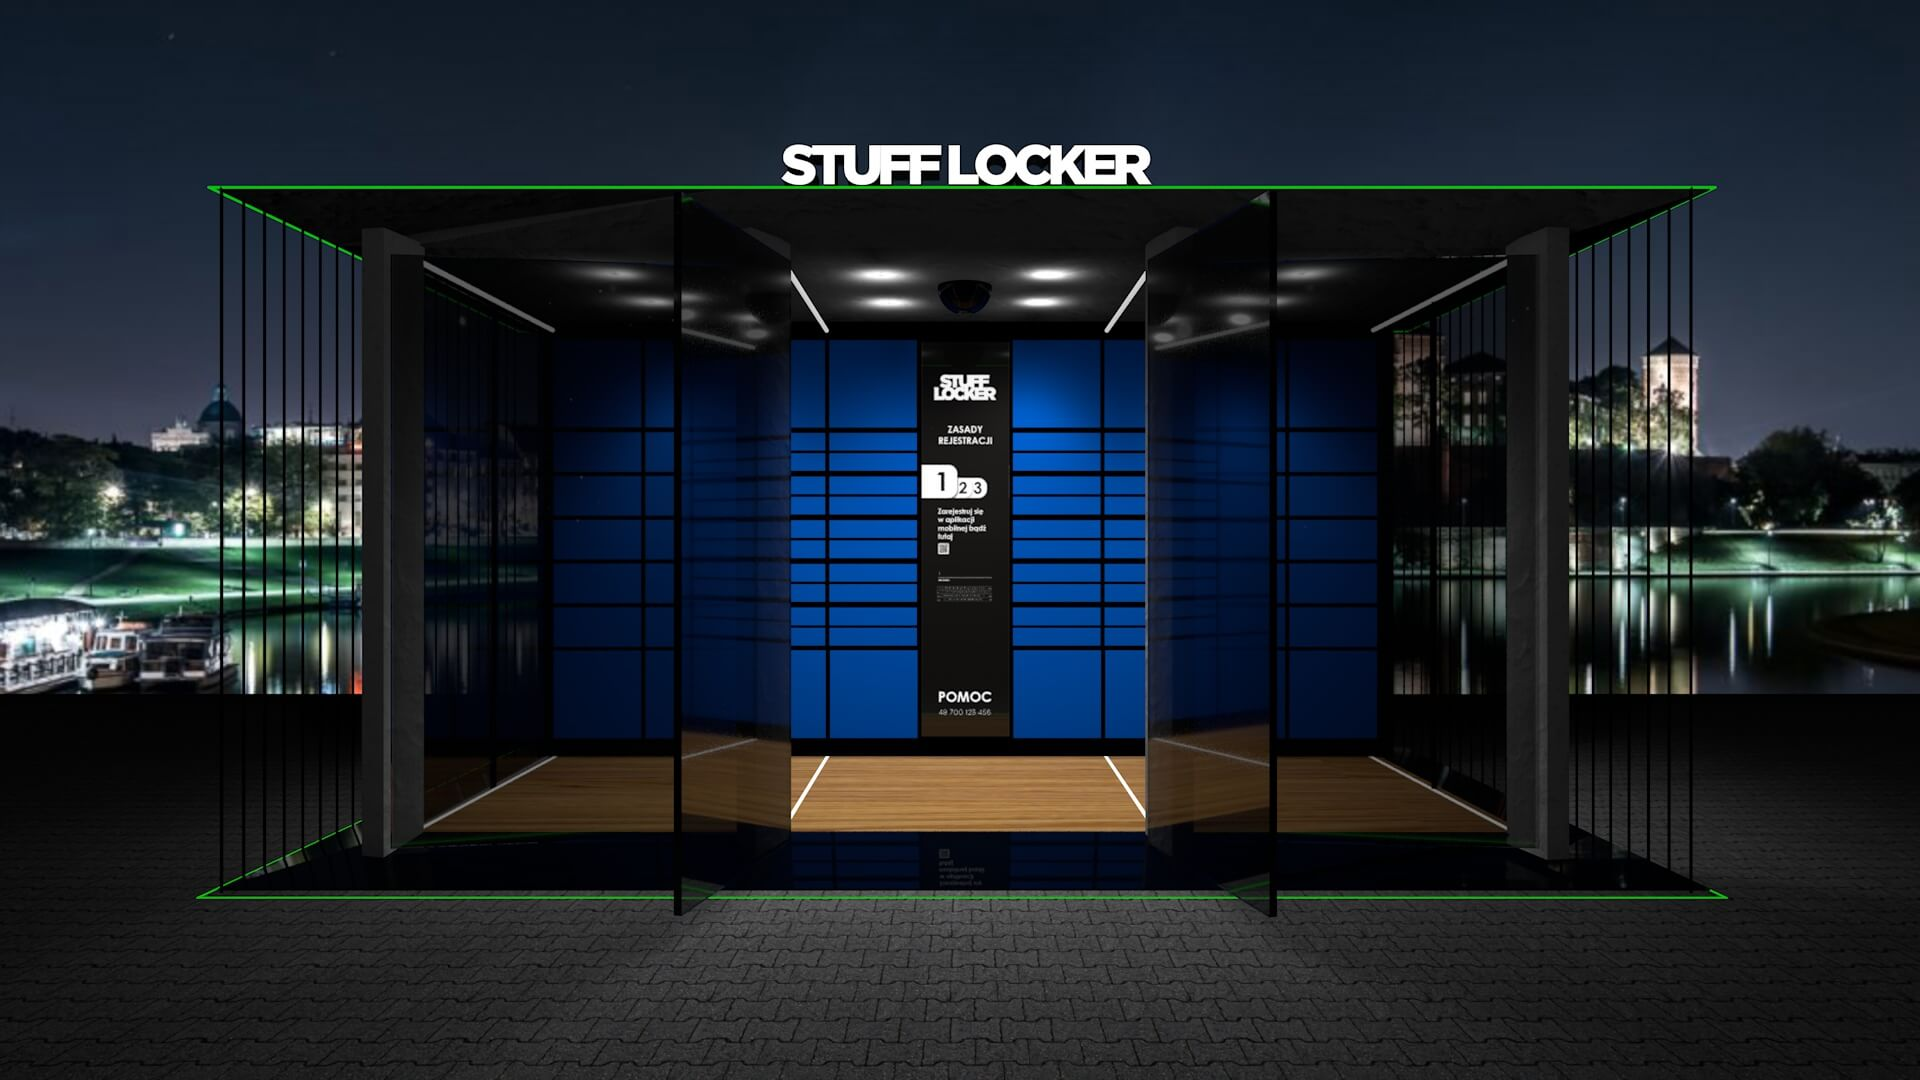 Wizualizacja 3D Stuff locker, skrytki premium